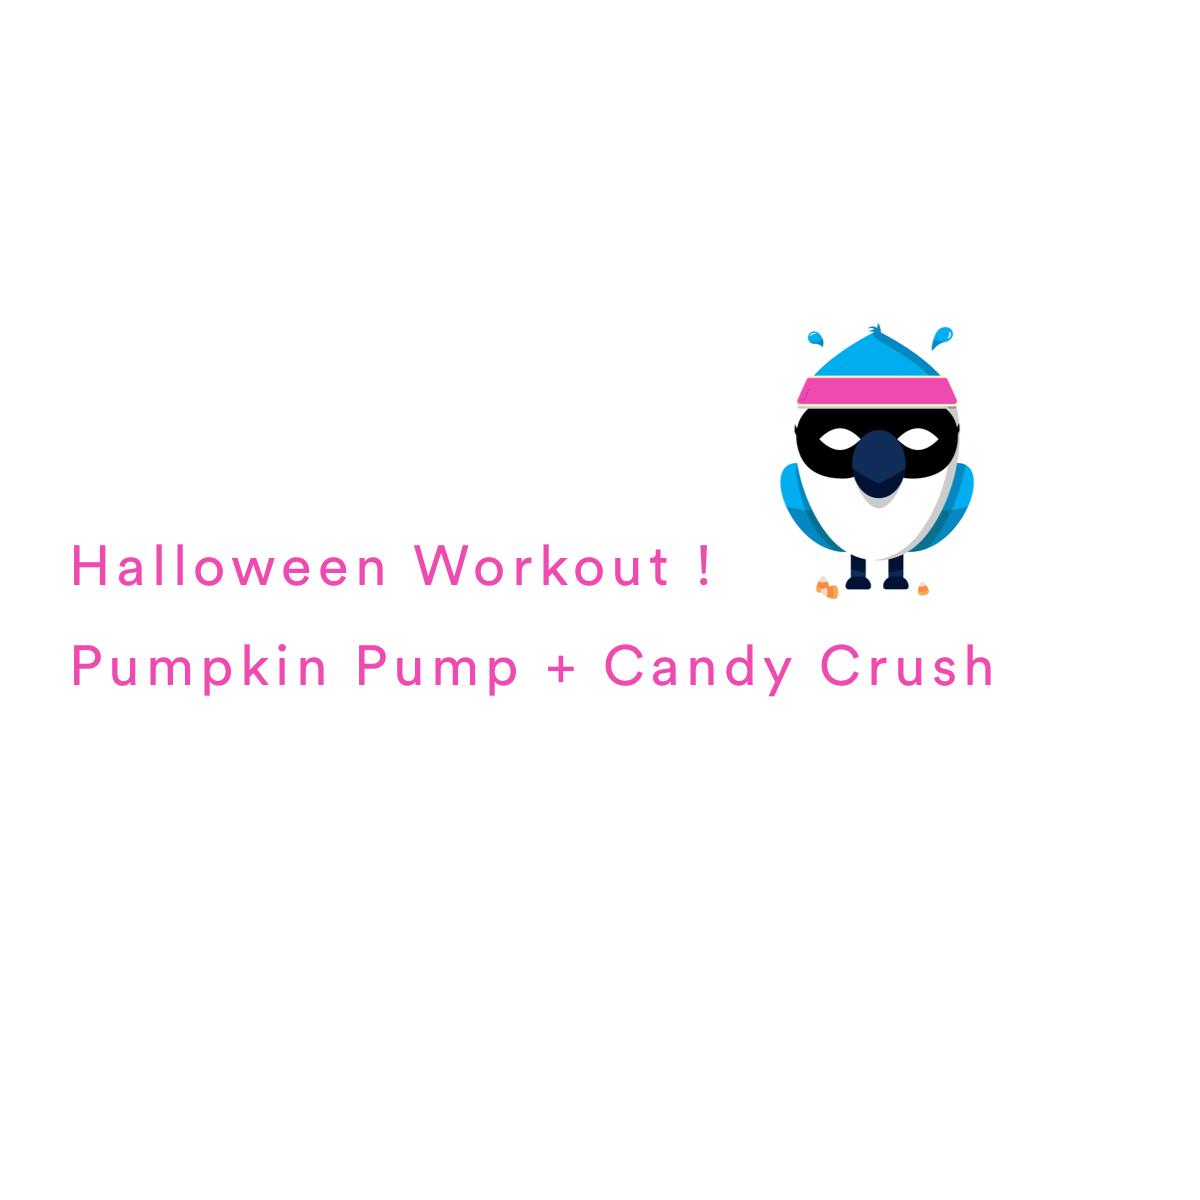 2020-10-31 Pumpkin Pump + Candy Crush by Coach Cheryl